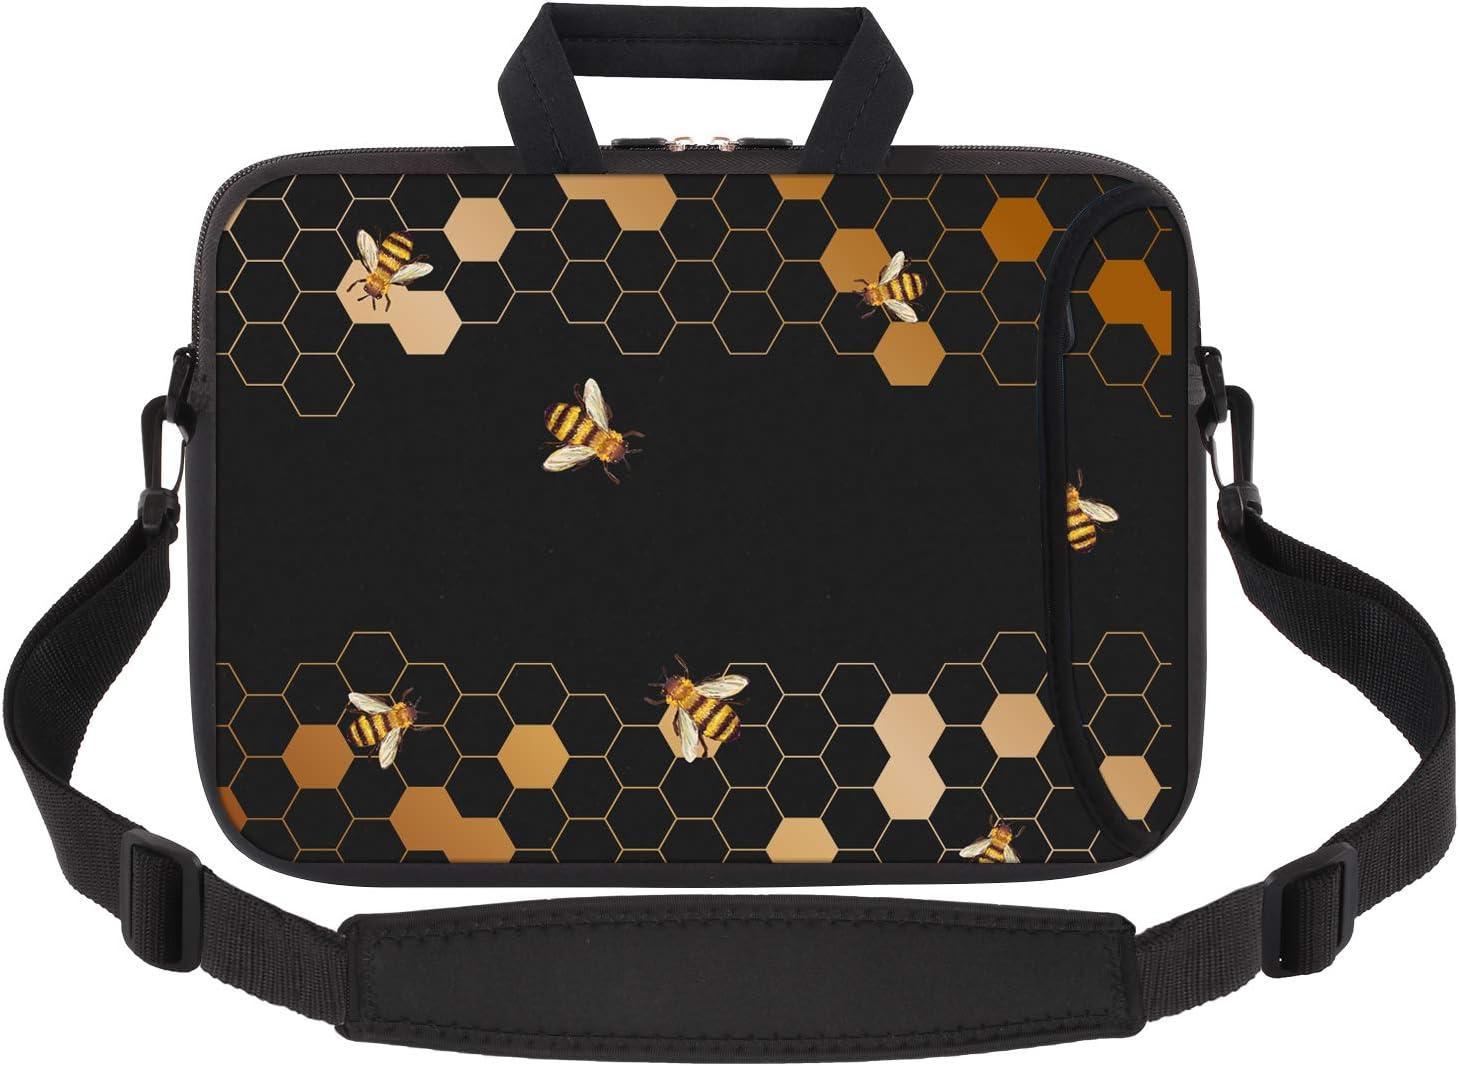 iCasso Laptop Sleeve Stylish Soft Neoprene Sleeve Case Cover Handbag for MacBook Air ,MacBook Retina 1iPad Pro/Ultrabook Netbook Tablet (11.6inch)